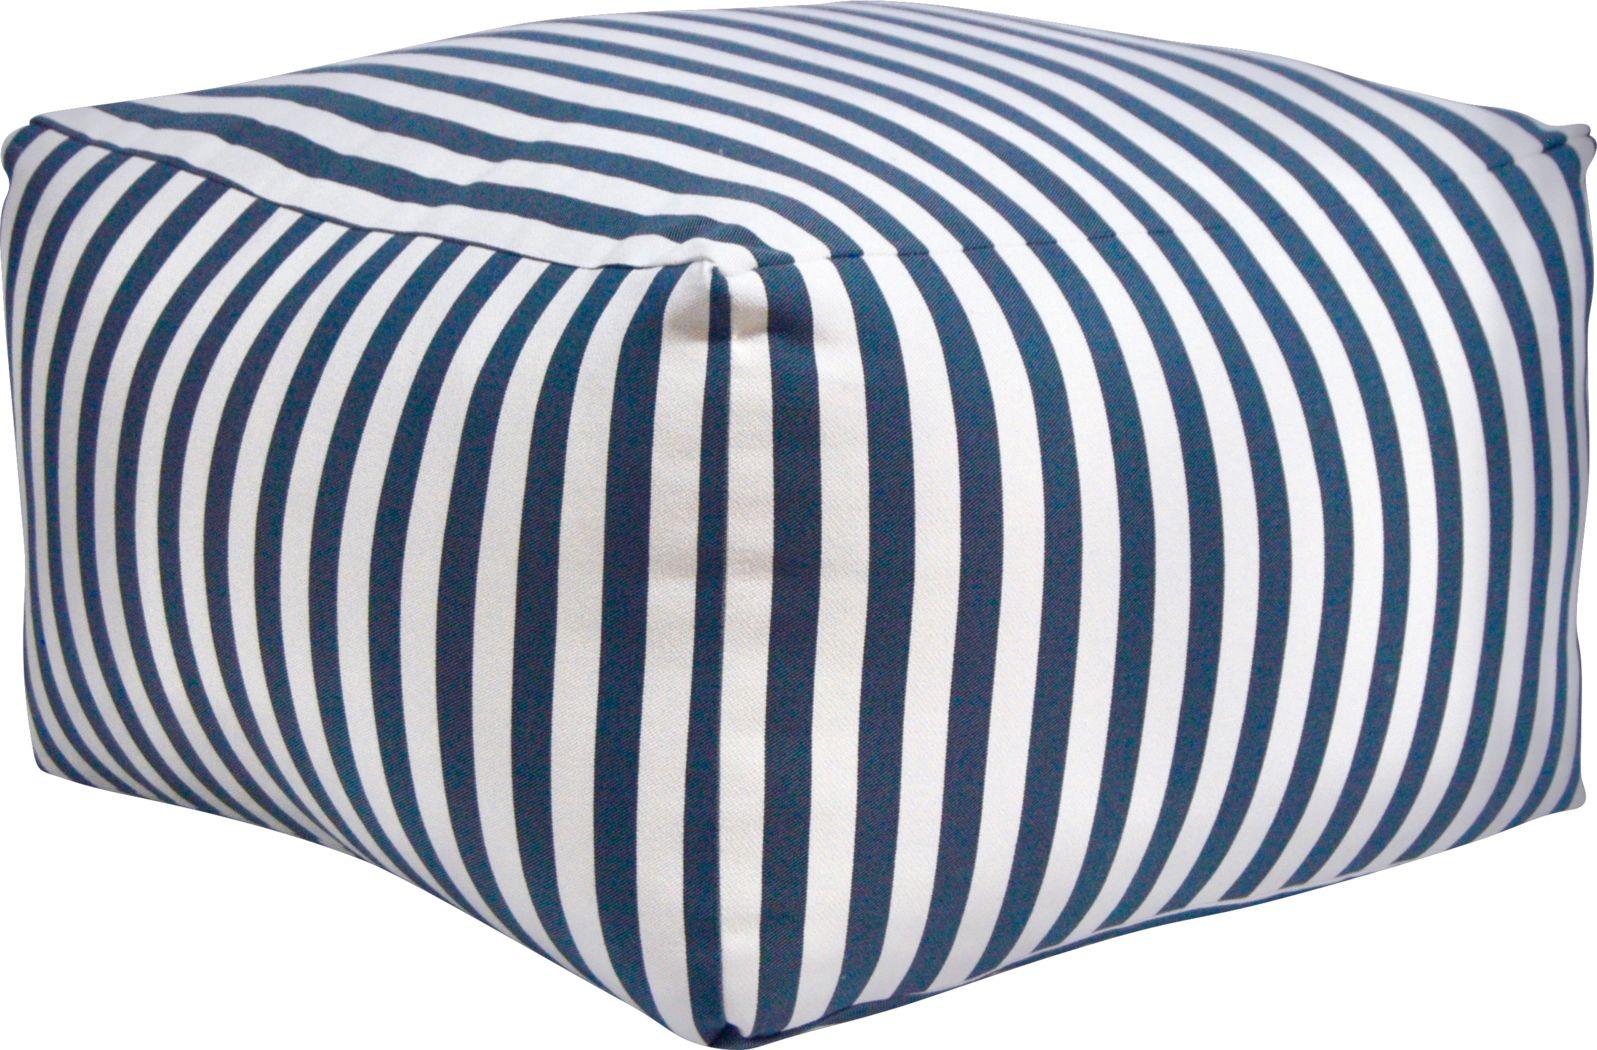 Caelus Black Striped Square Pouf